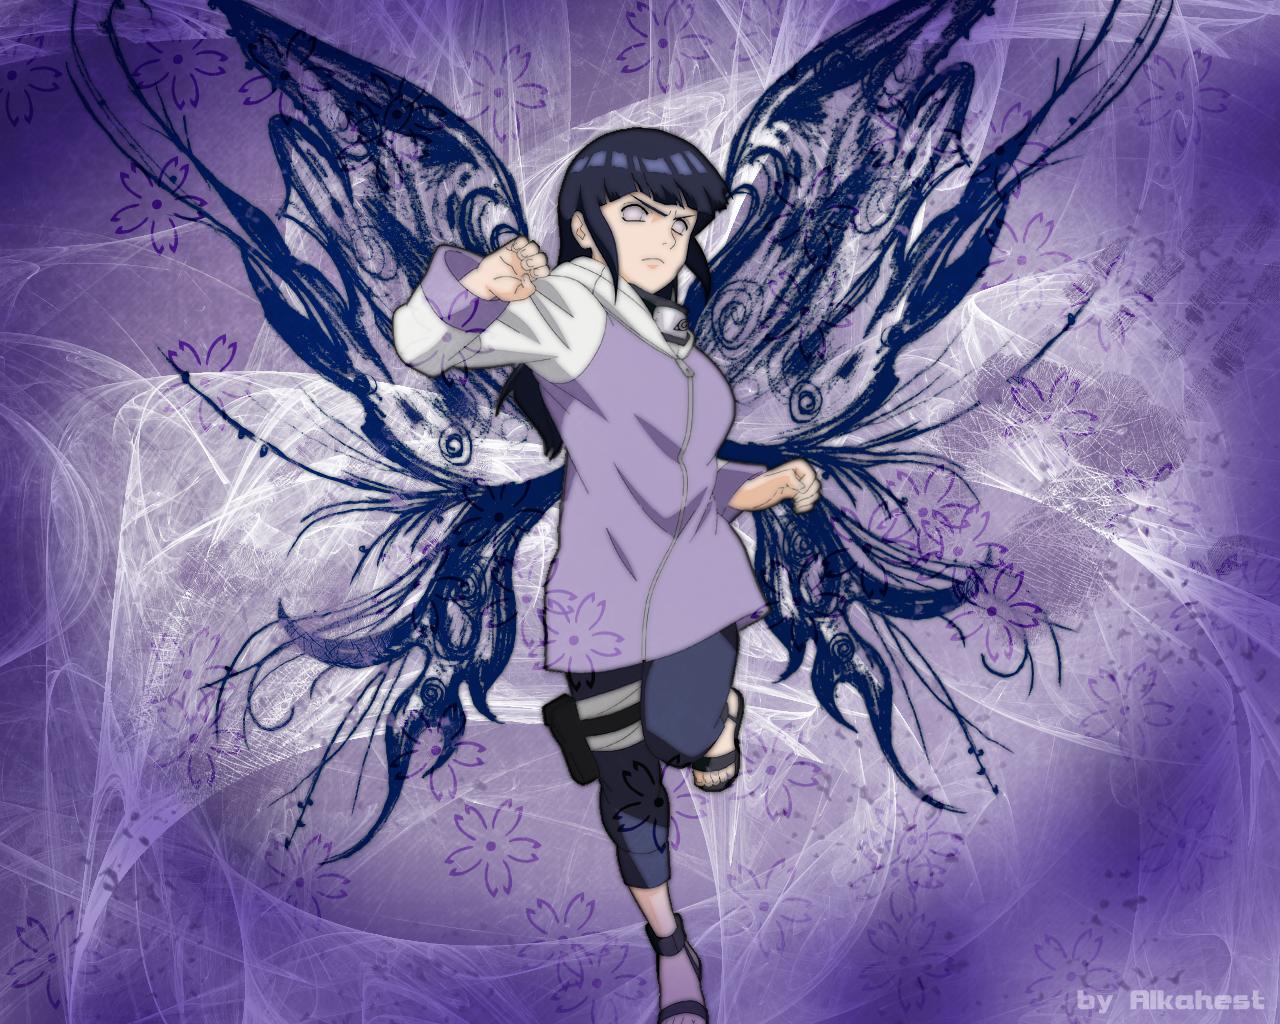 Naruto Hinata Wallpaper - WallpaperSafari